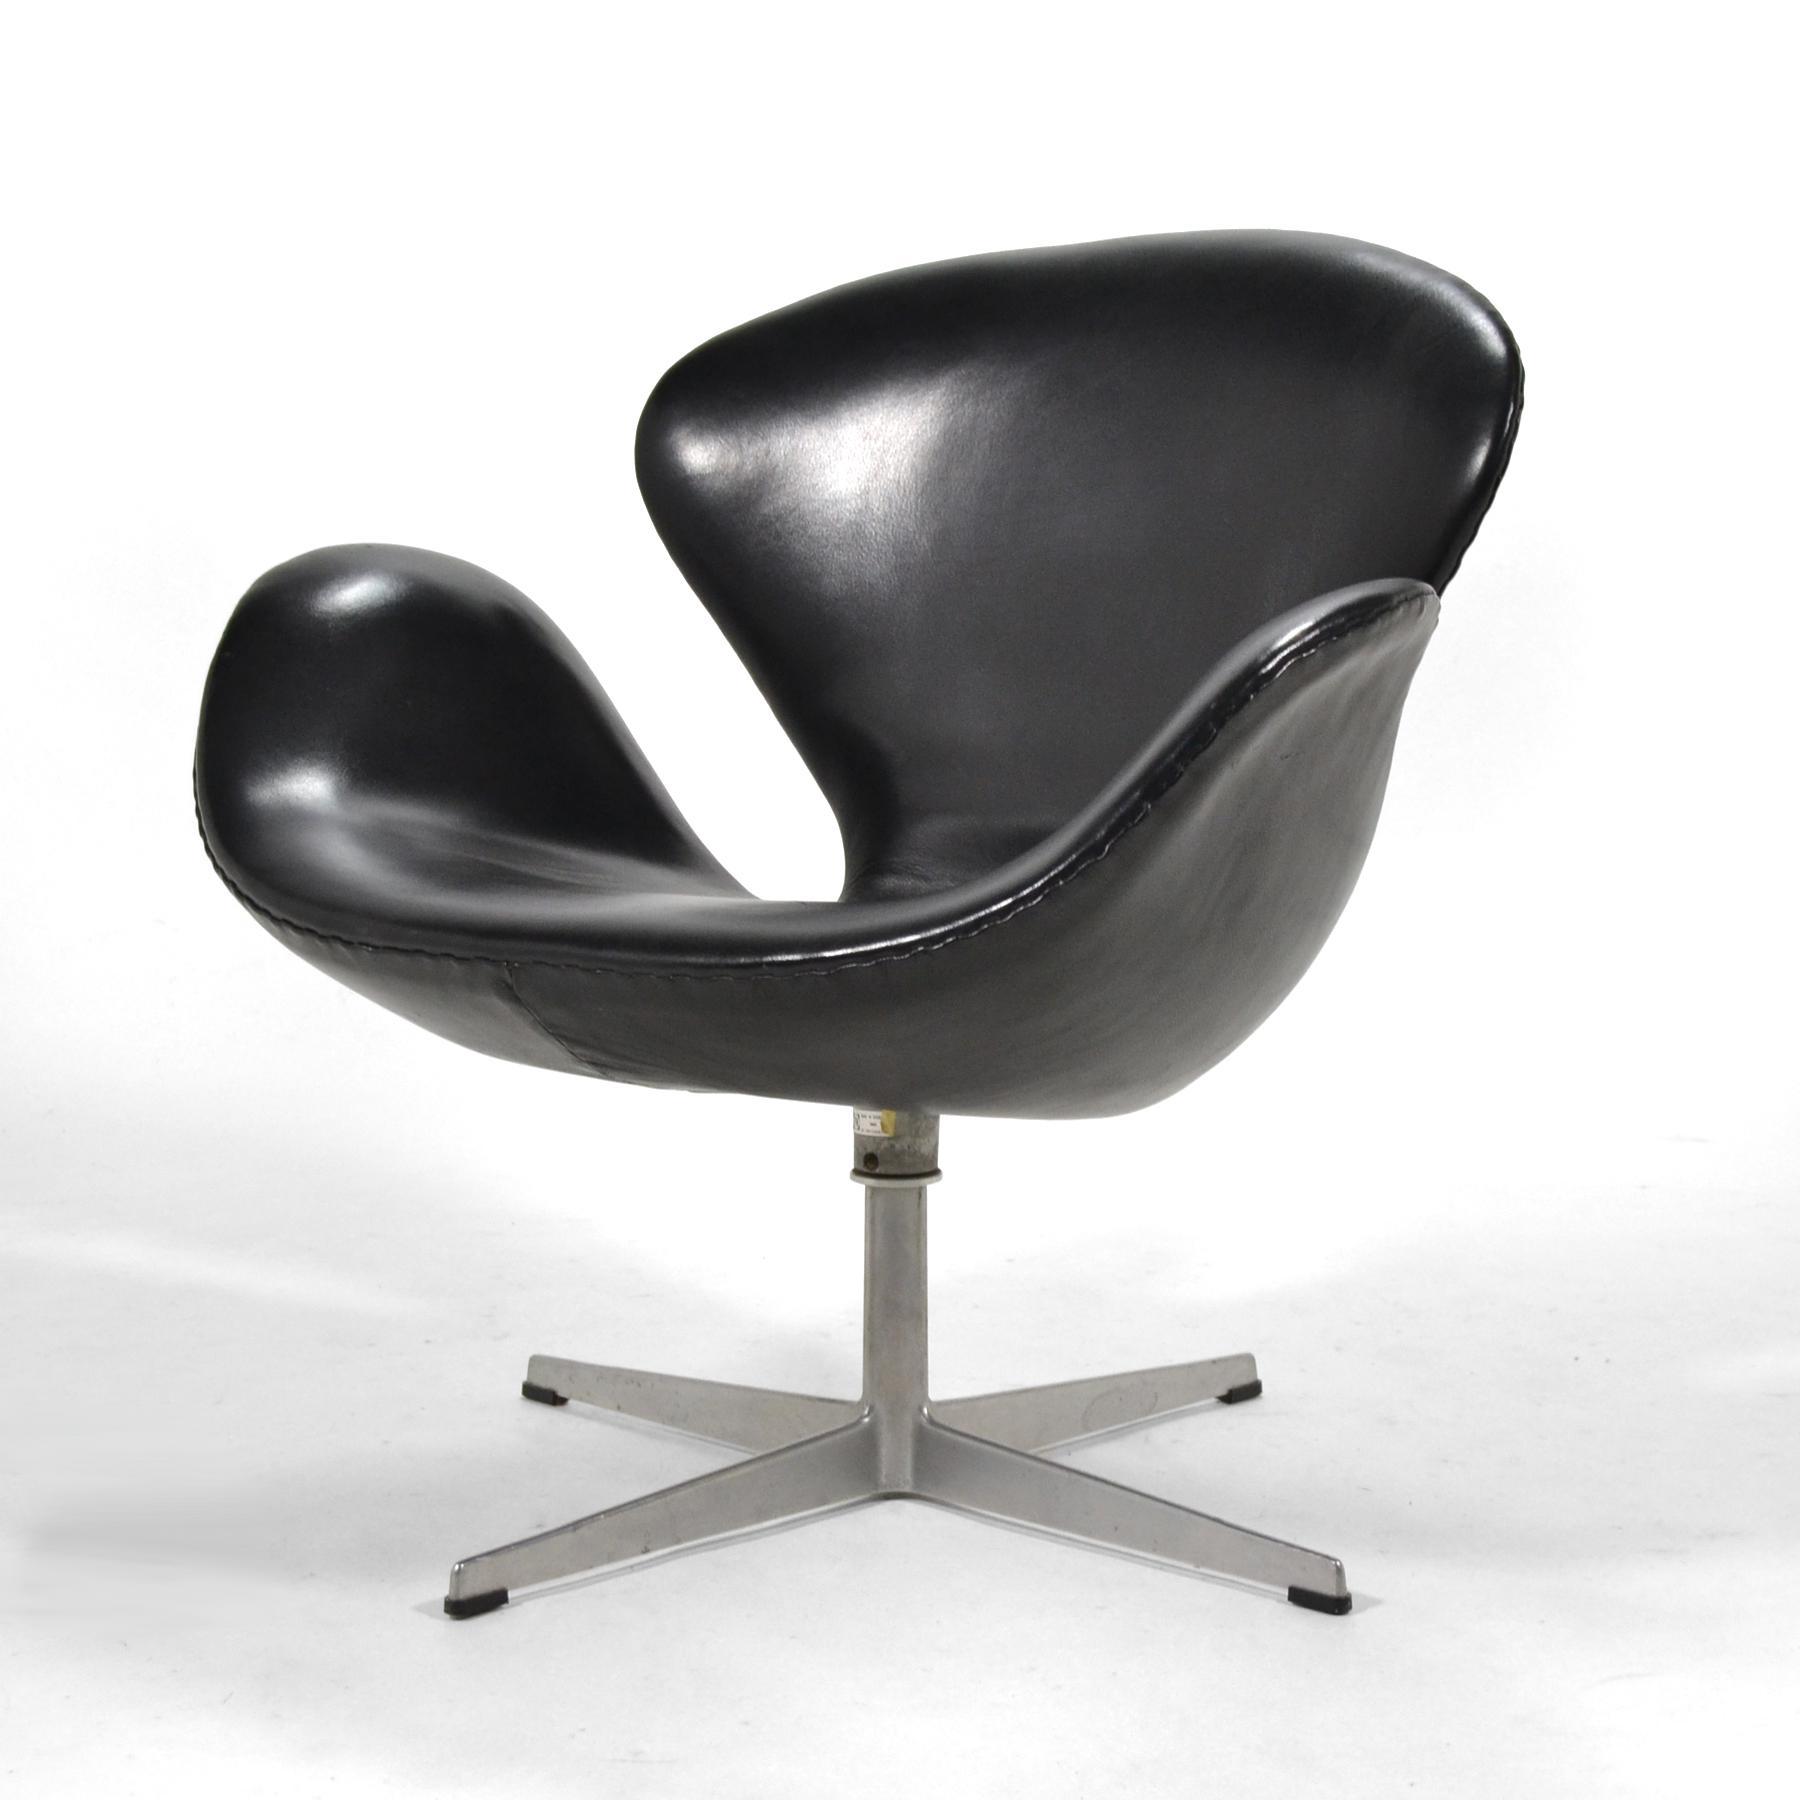 Arne Jacobsen Swan Chair In Black Leather By Fritz Hansen   Image 4 Of 8